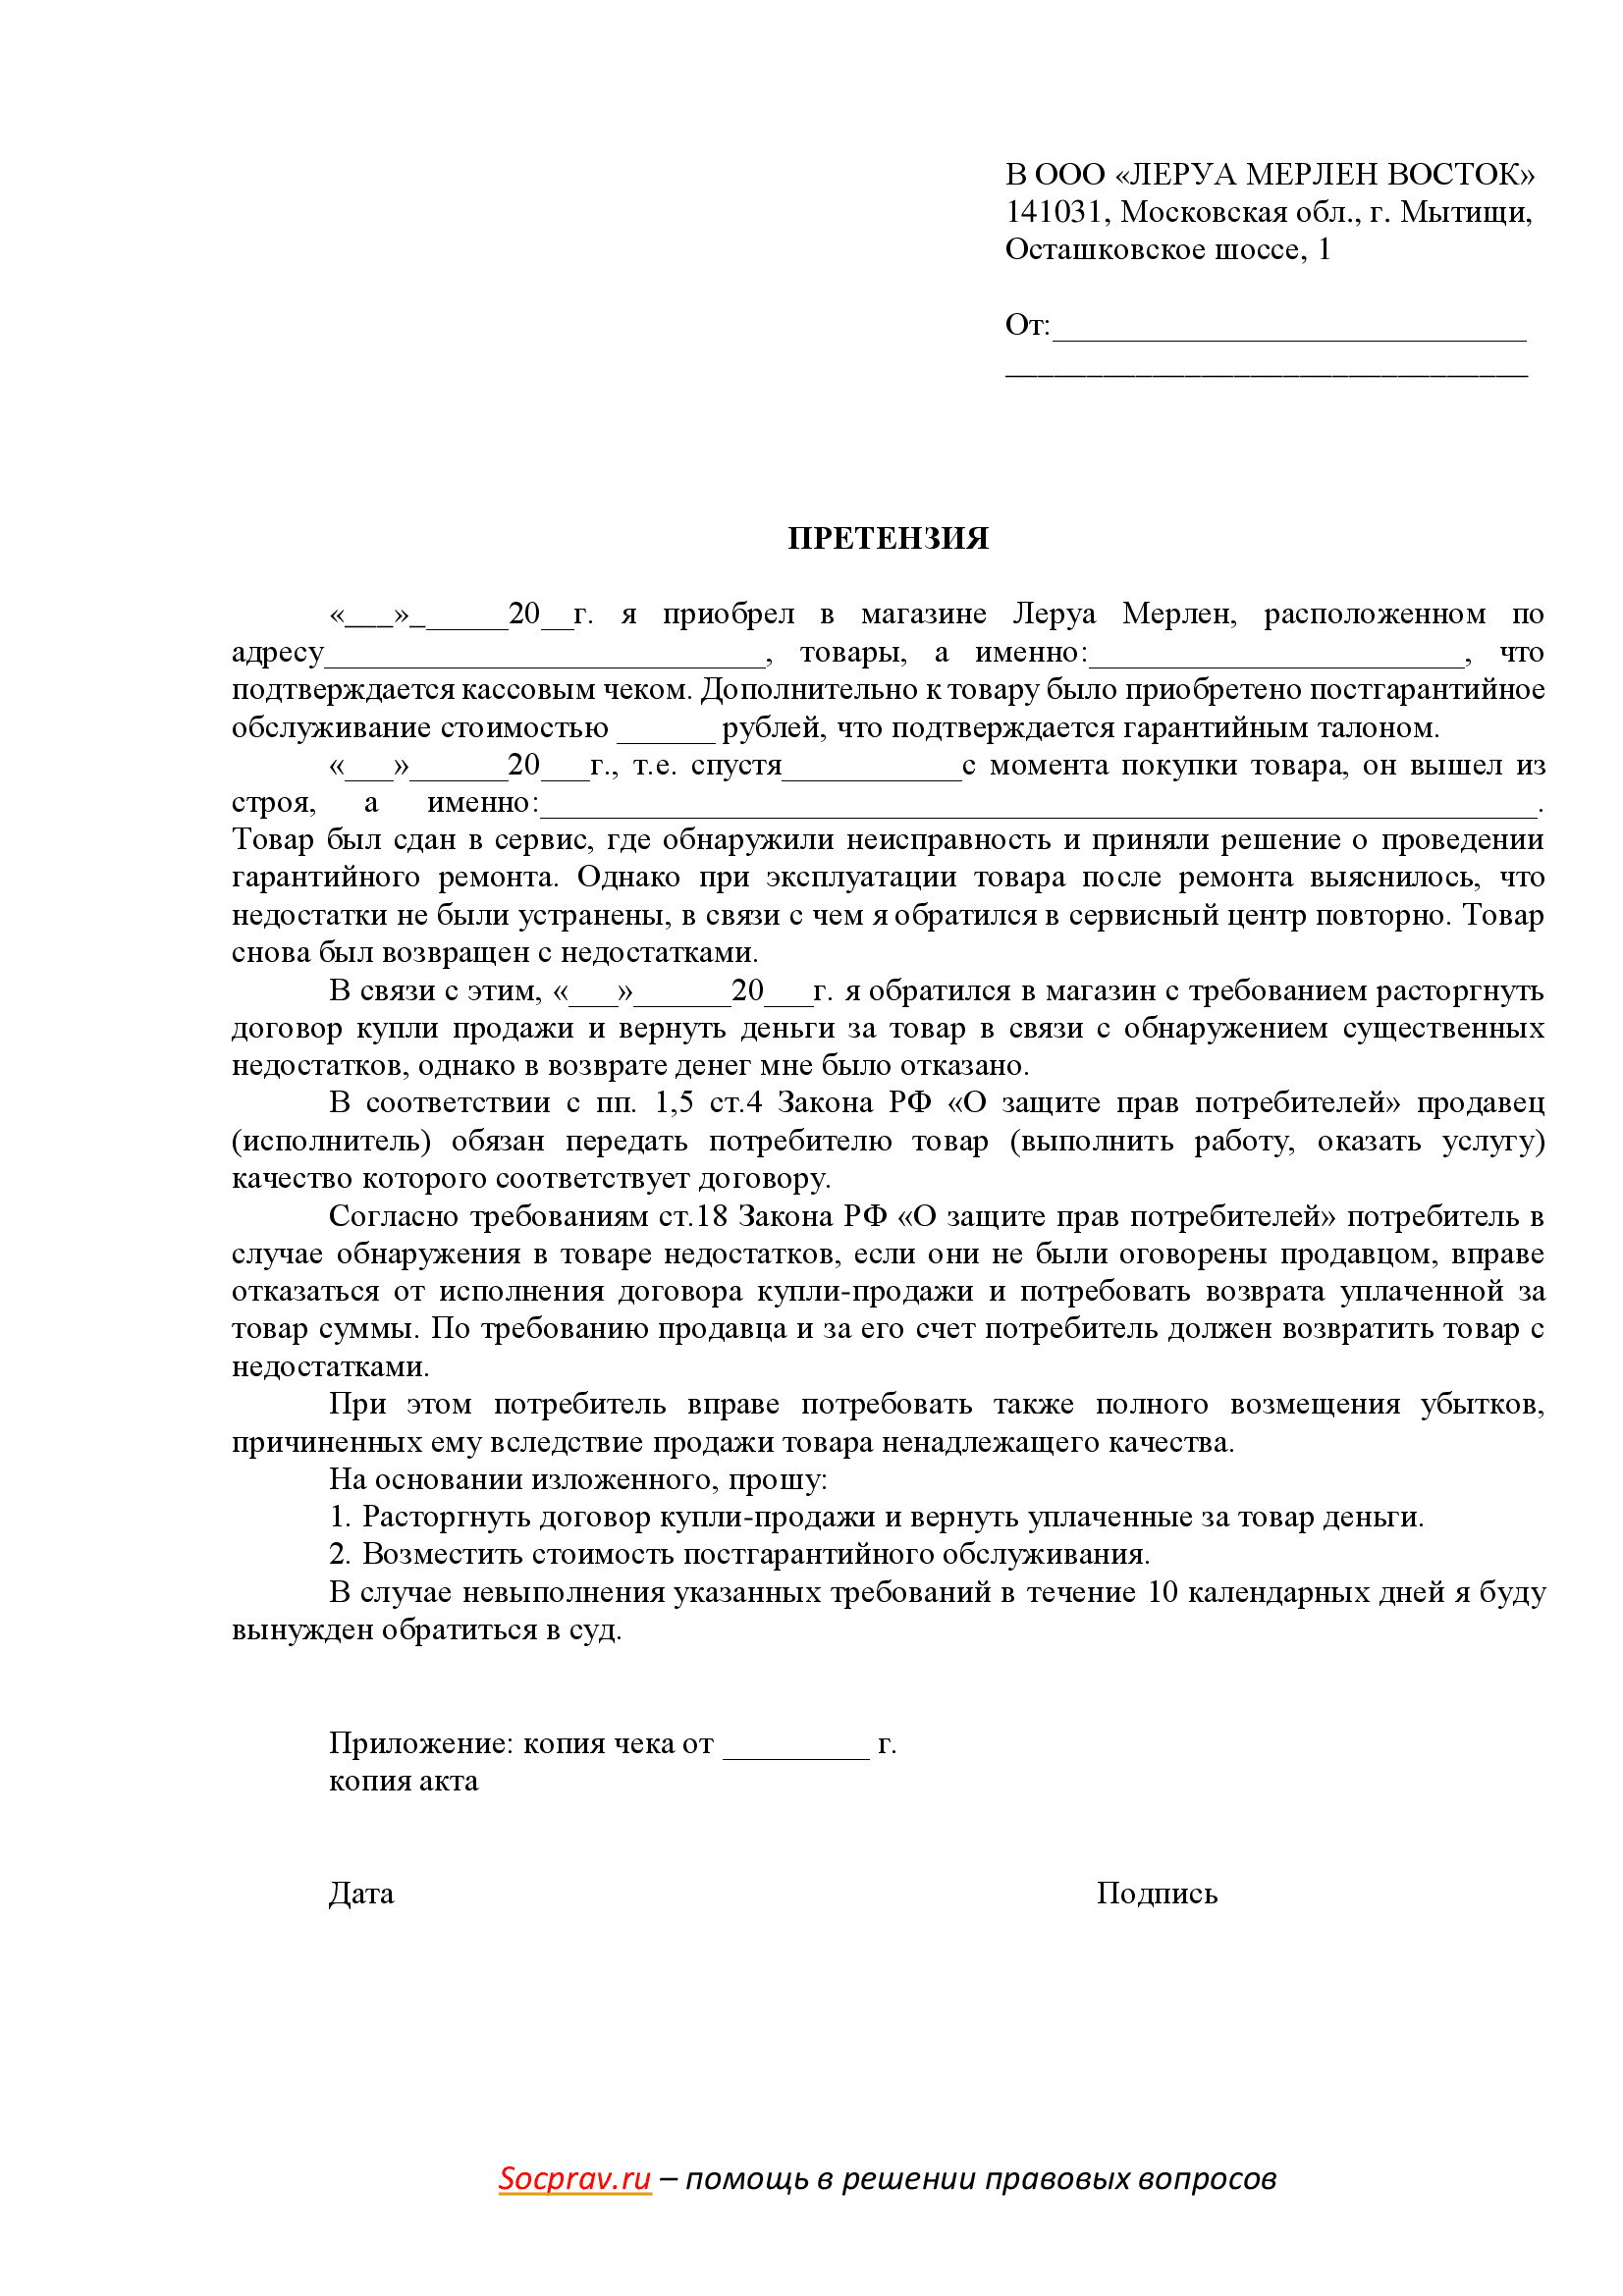 Претензия в Леруа Мерлен